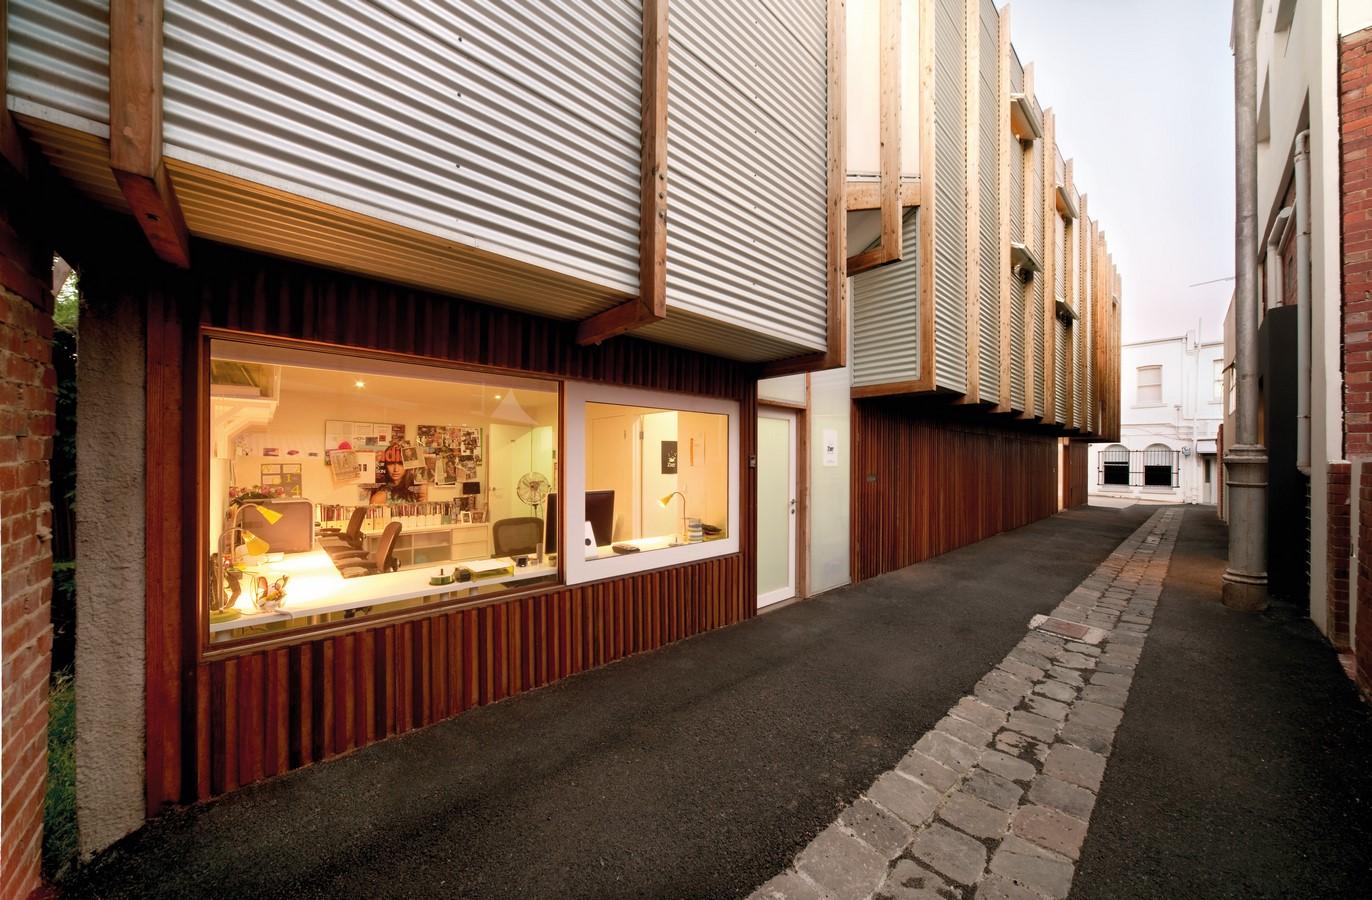 yan lane by Justin Mallia Architecture - Sheet3